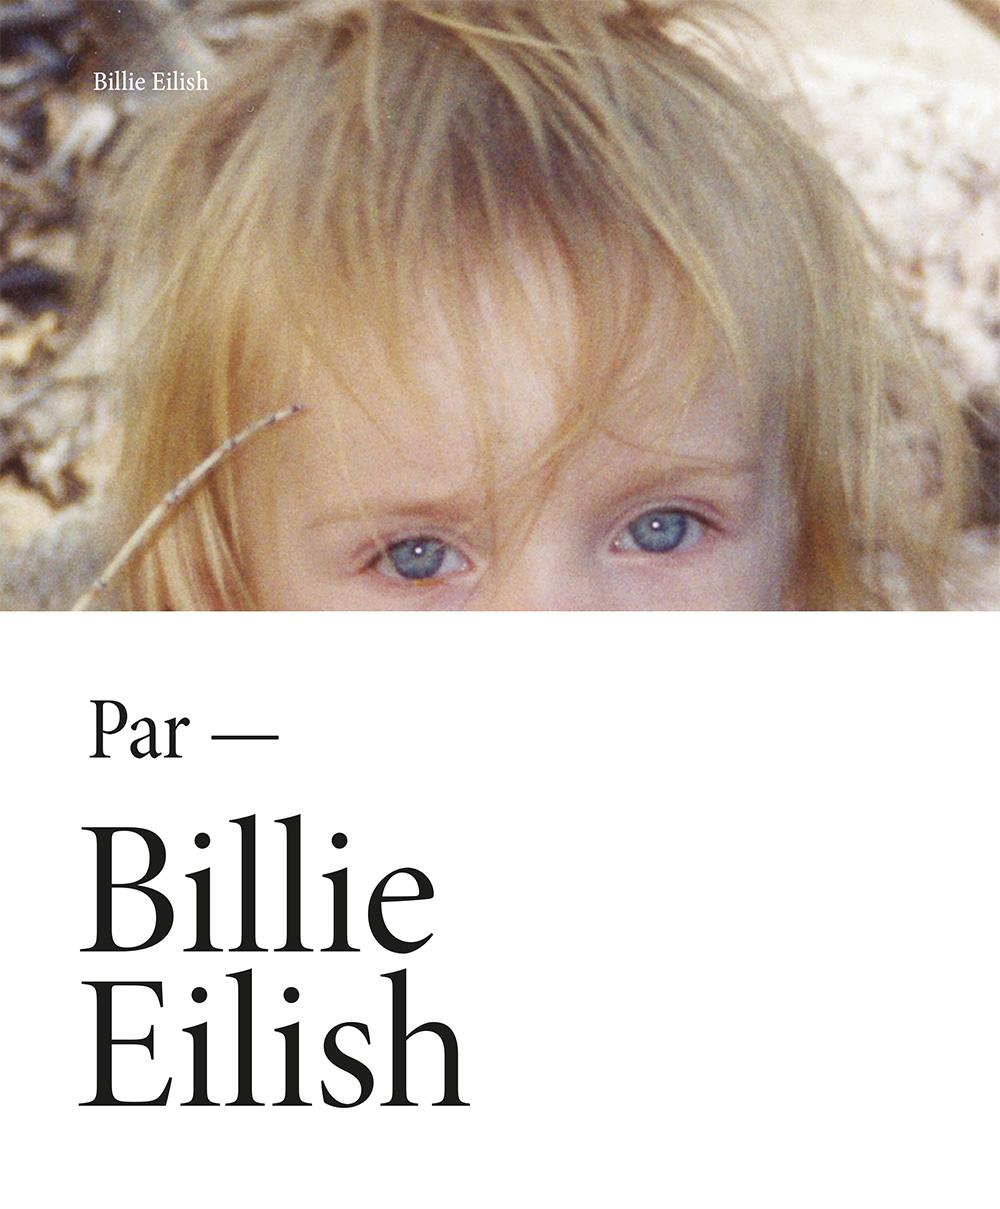 Billie Eilish Image